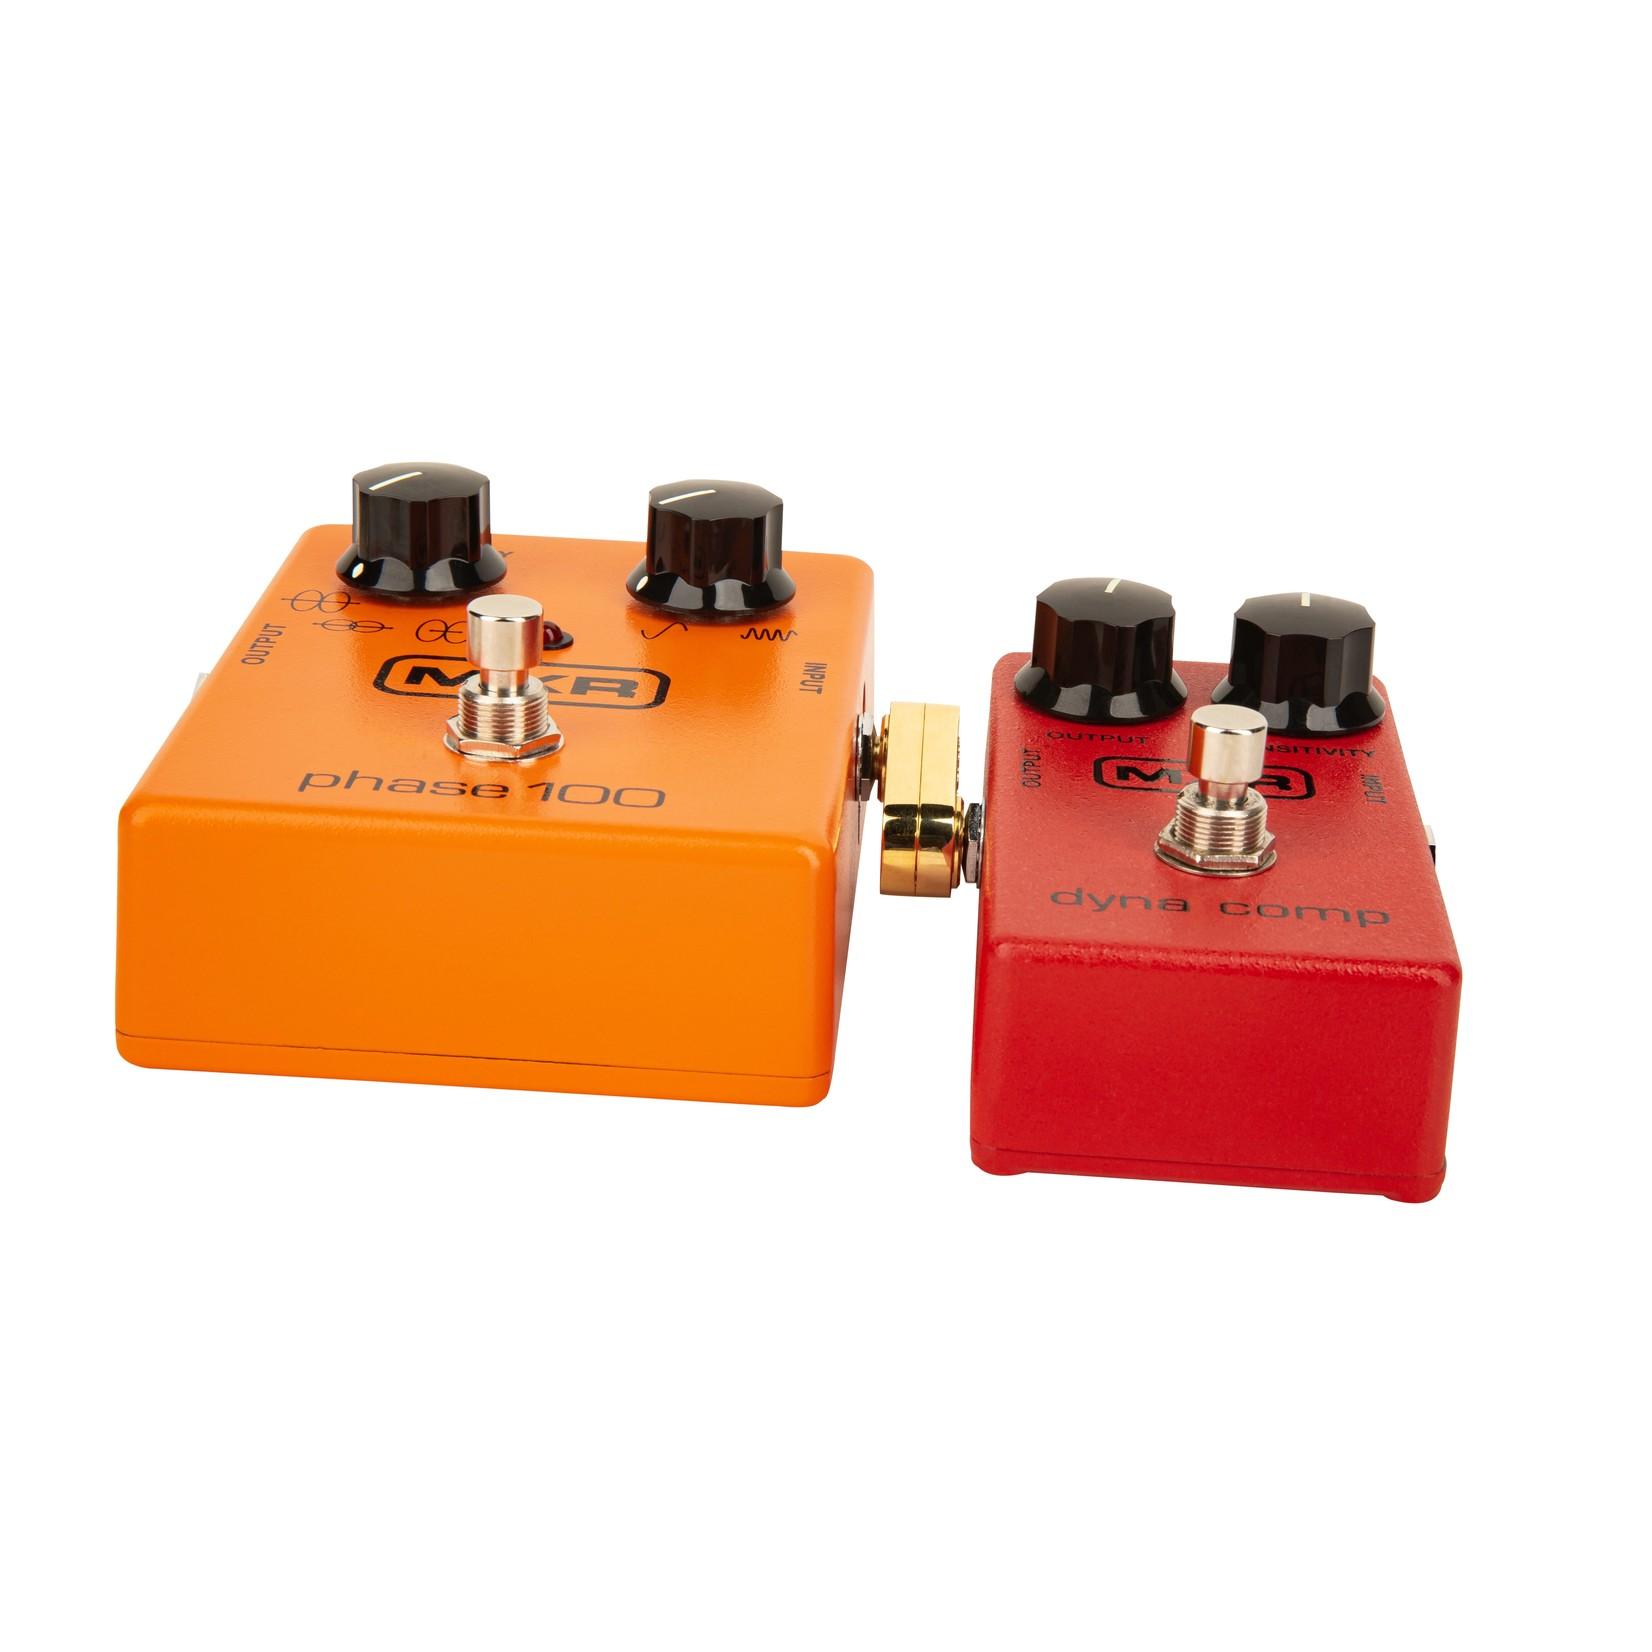 Rockboard RockBoard SliderPlug Pedal Connector with Adjustable Plug Offset, Gold - NEW!